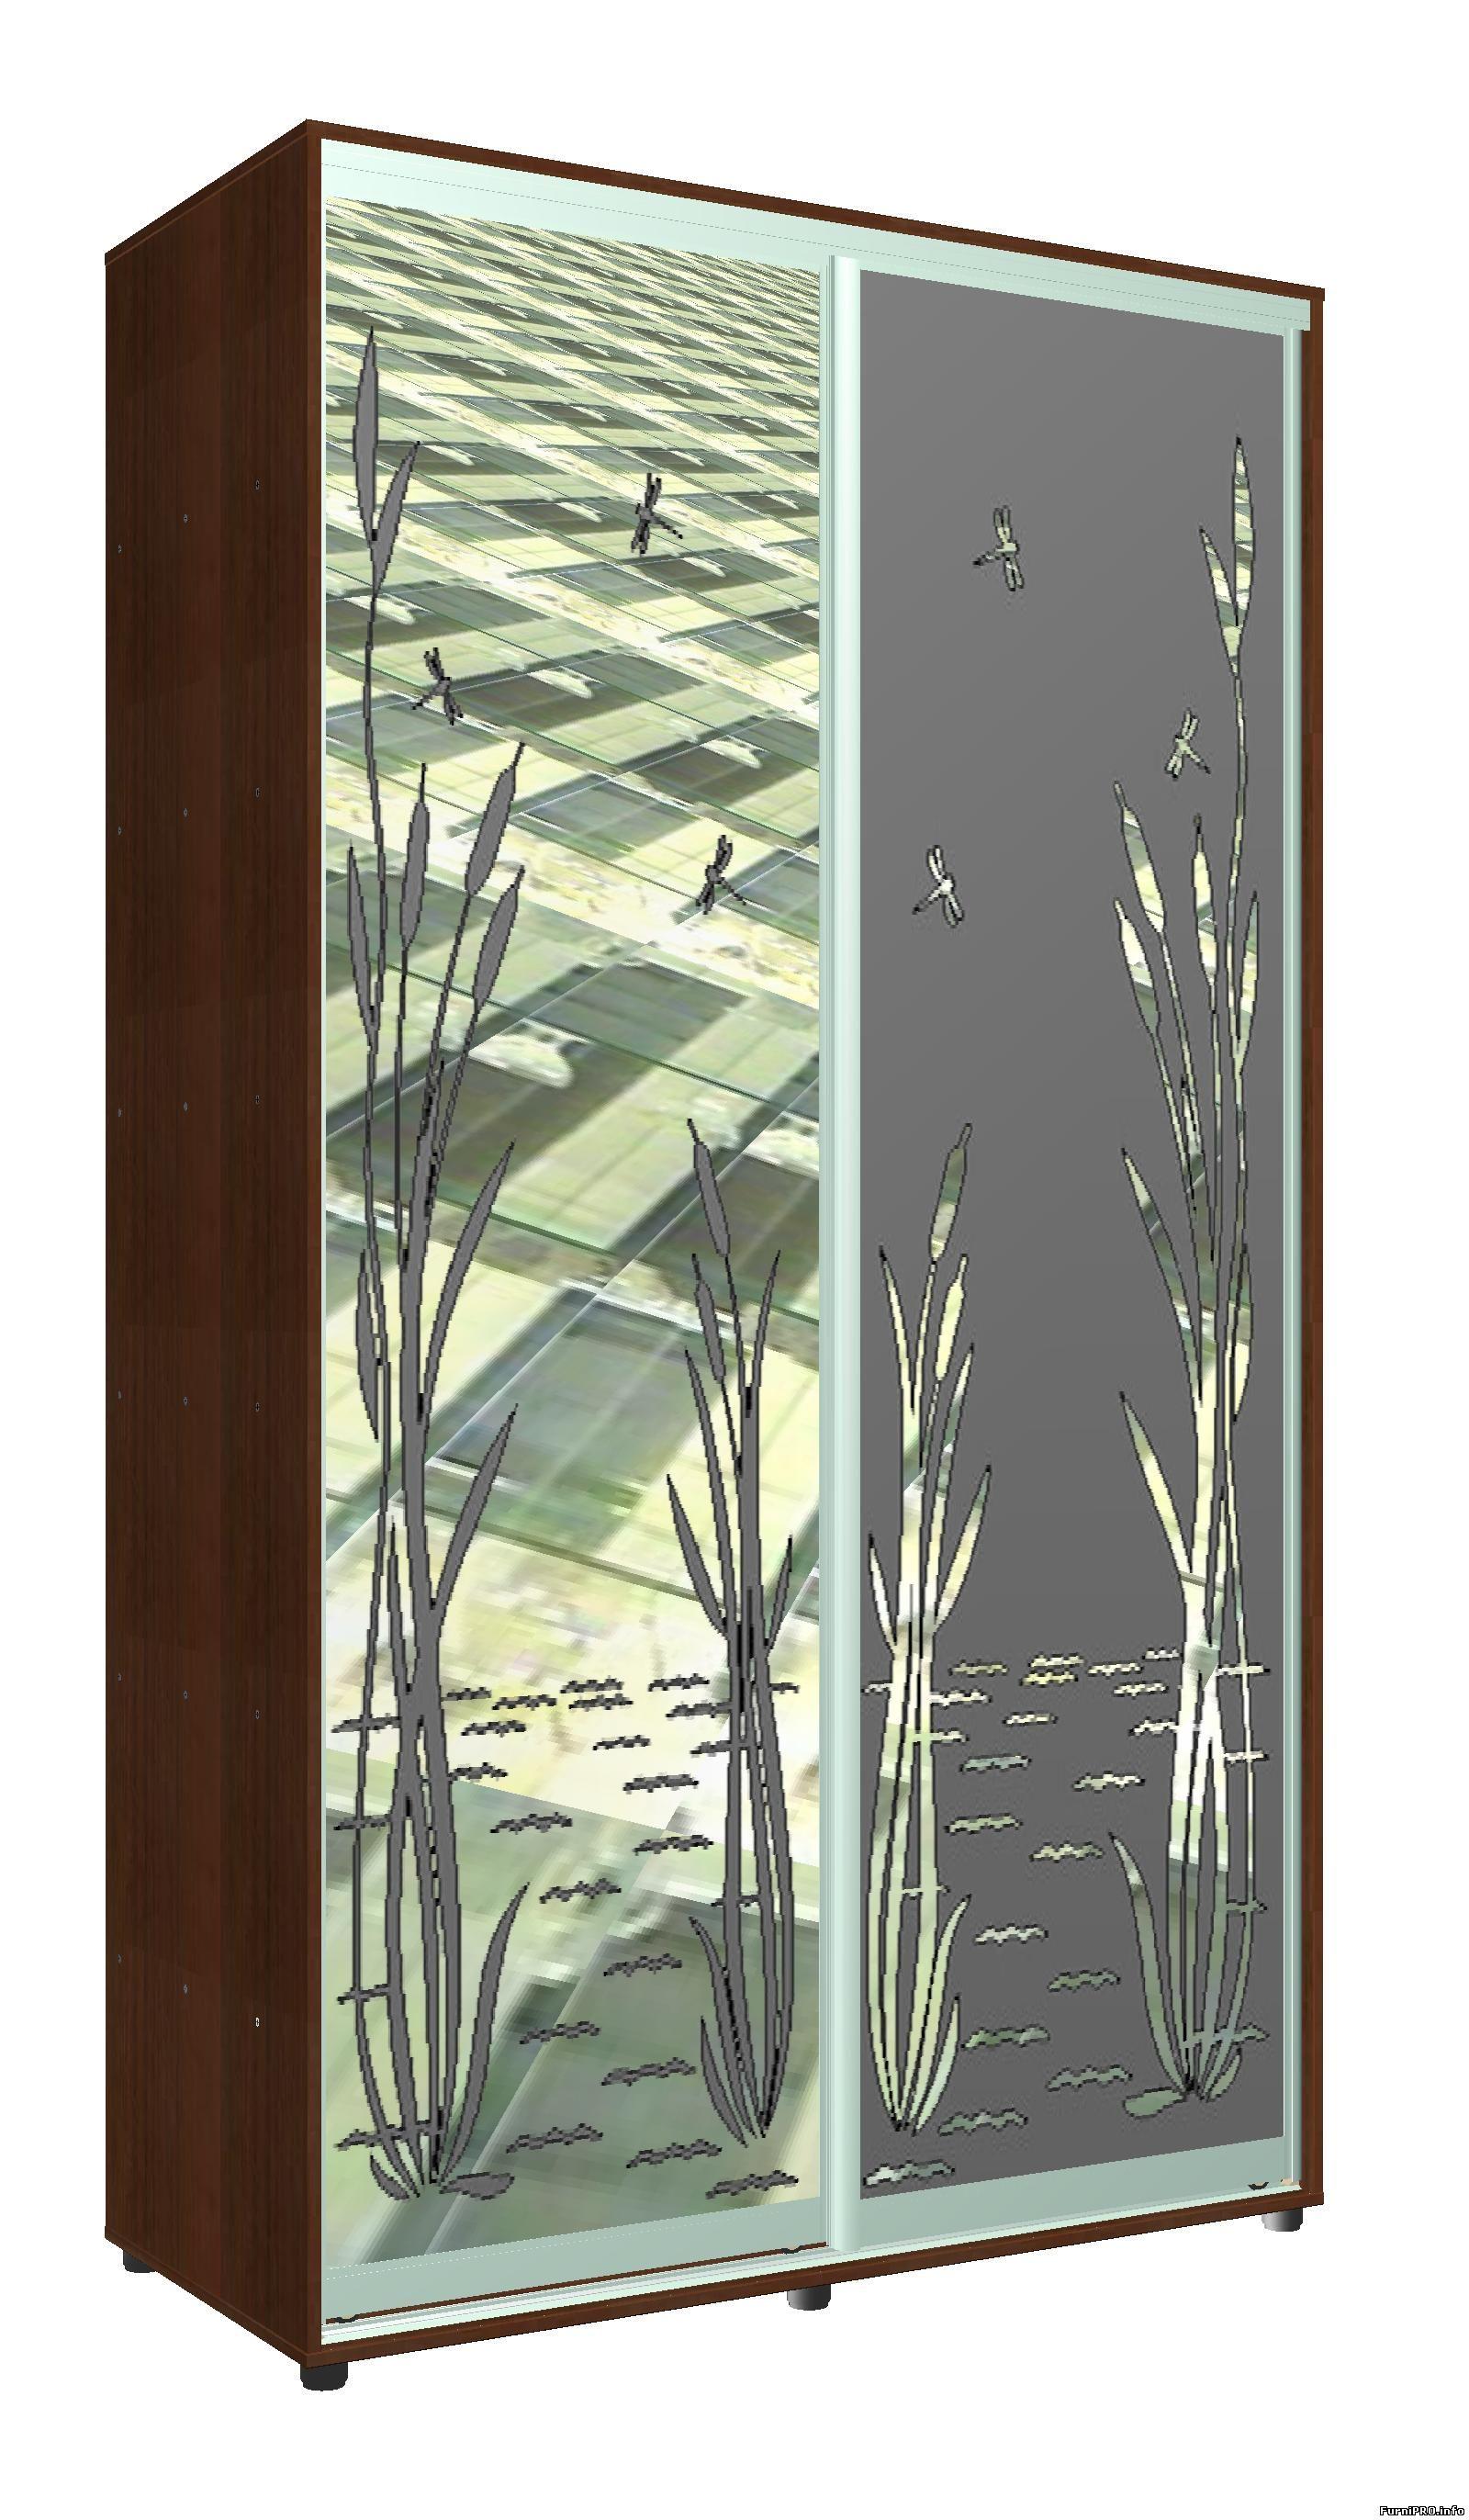 Текстура для дверей шкафа - купе